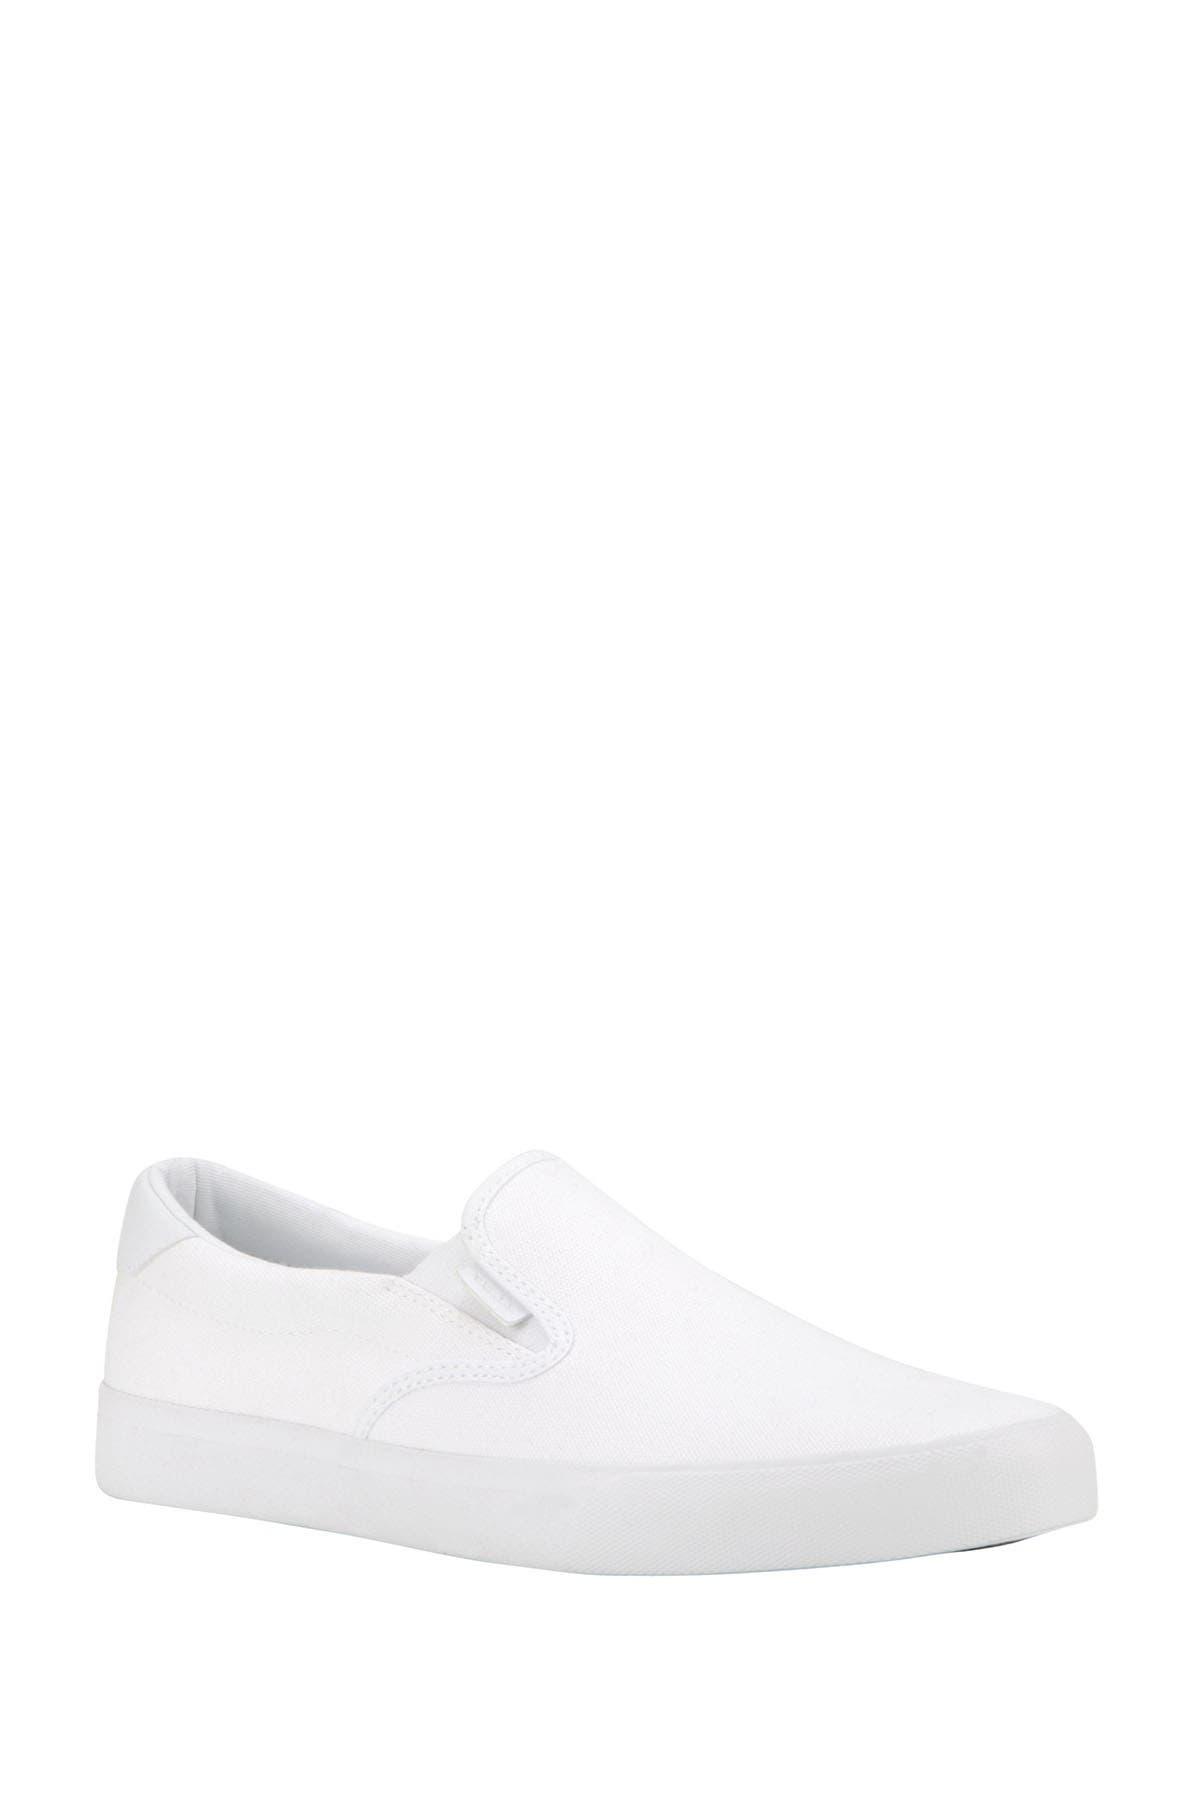 Image of Lugz Clipper Slip-On Sneaker